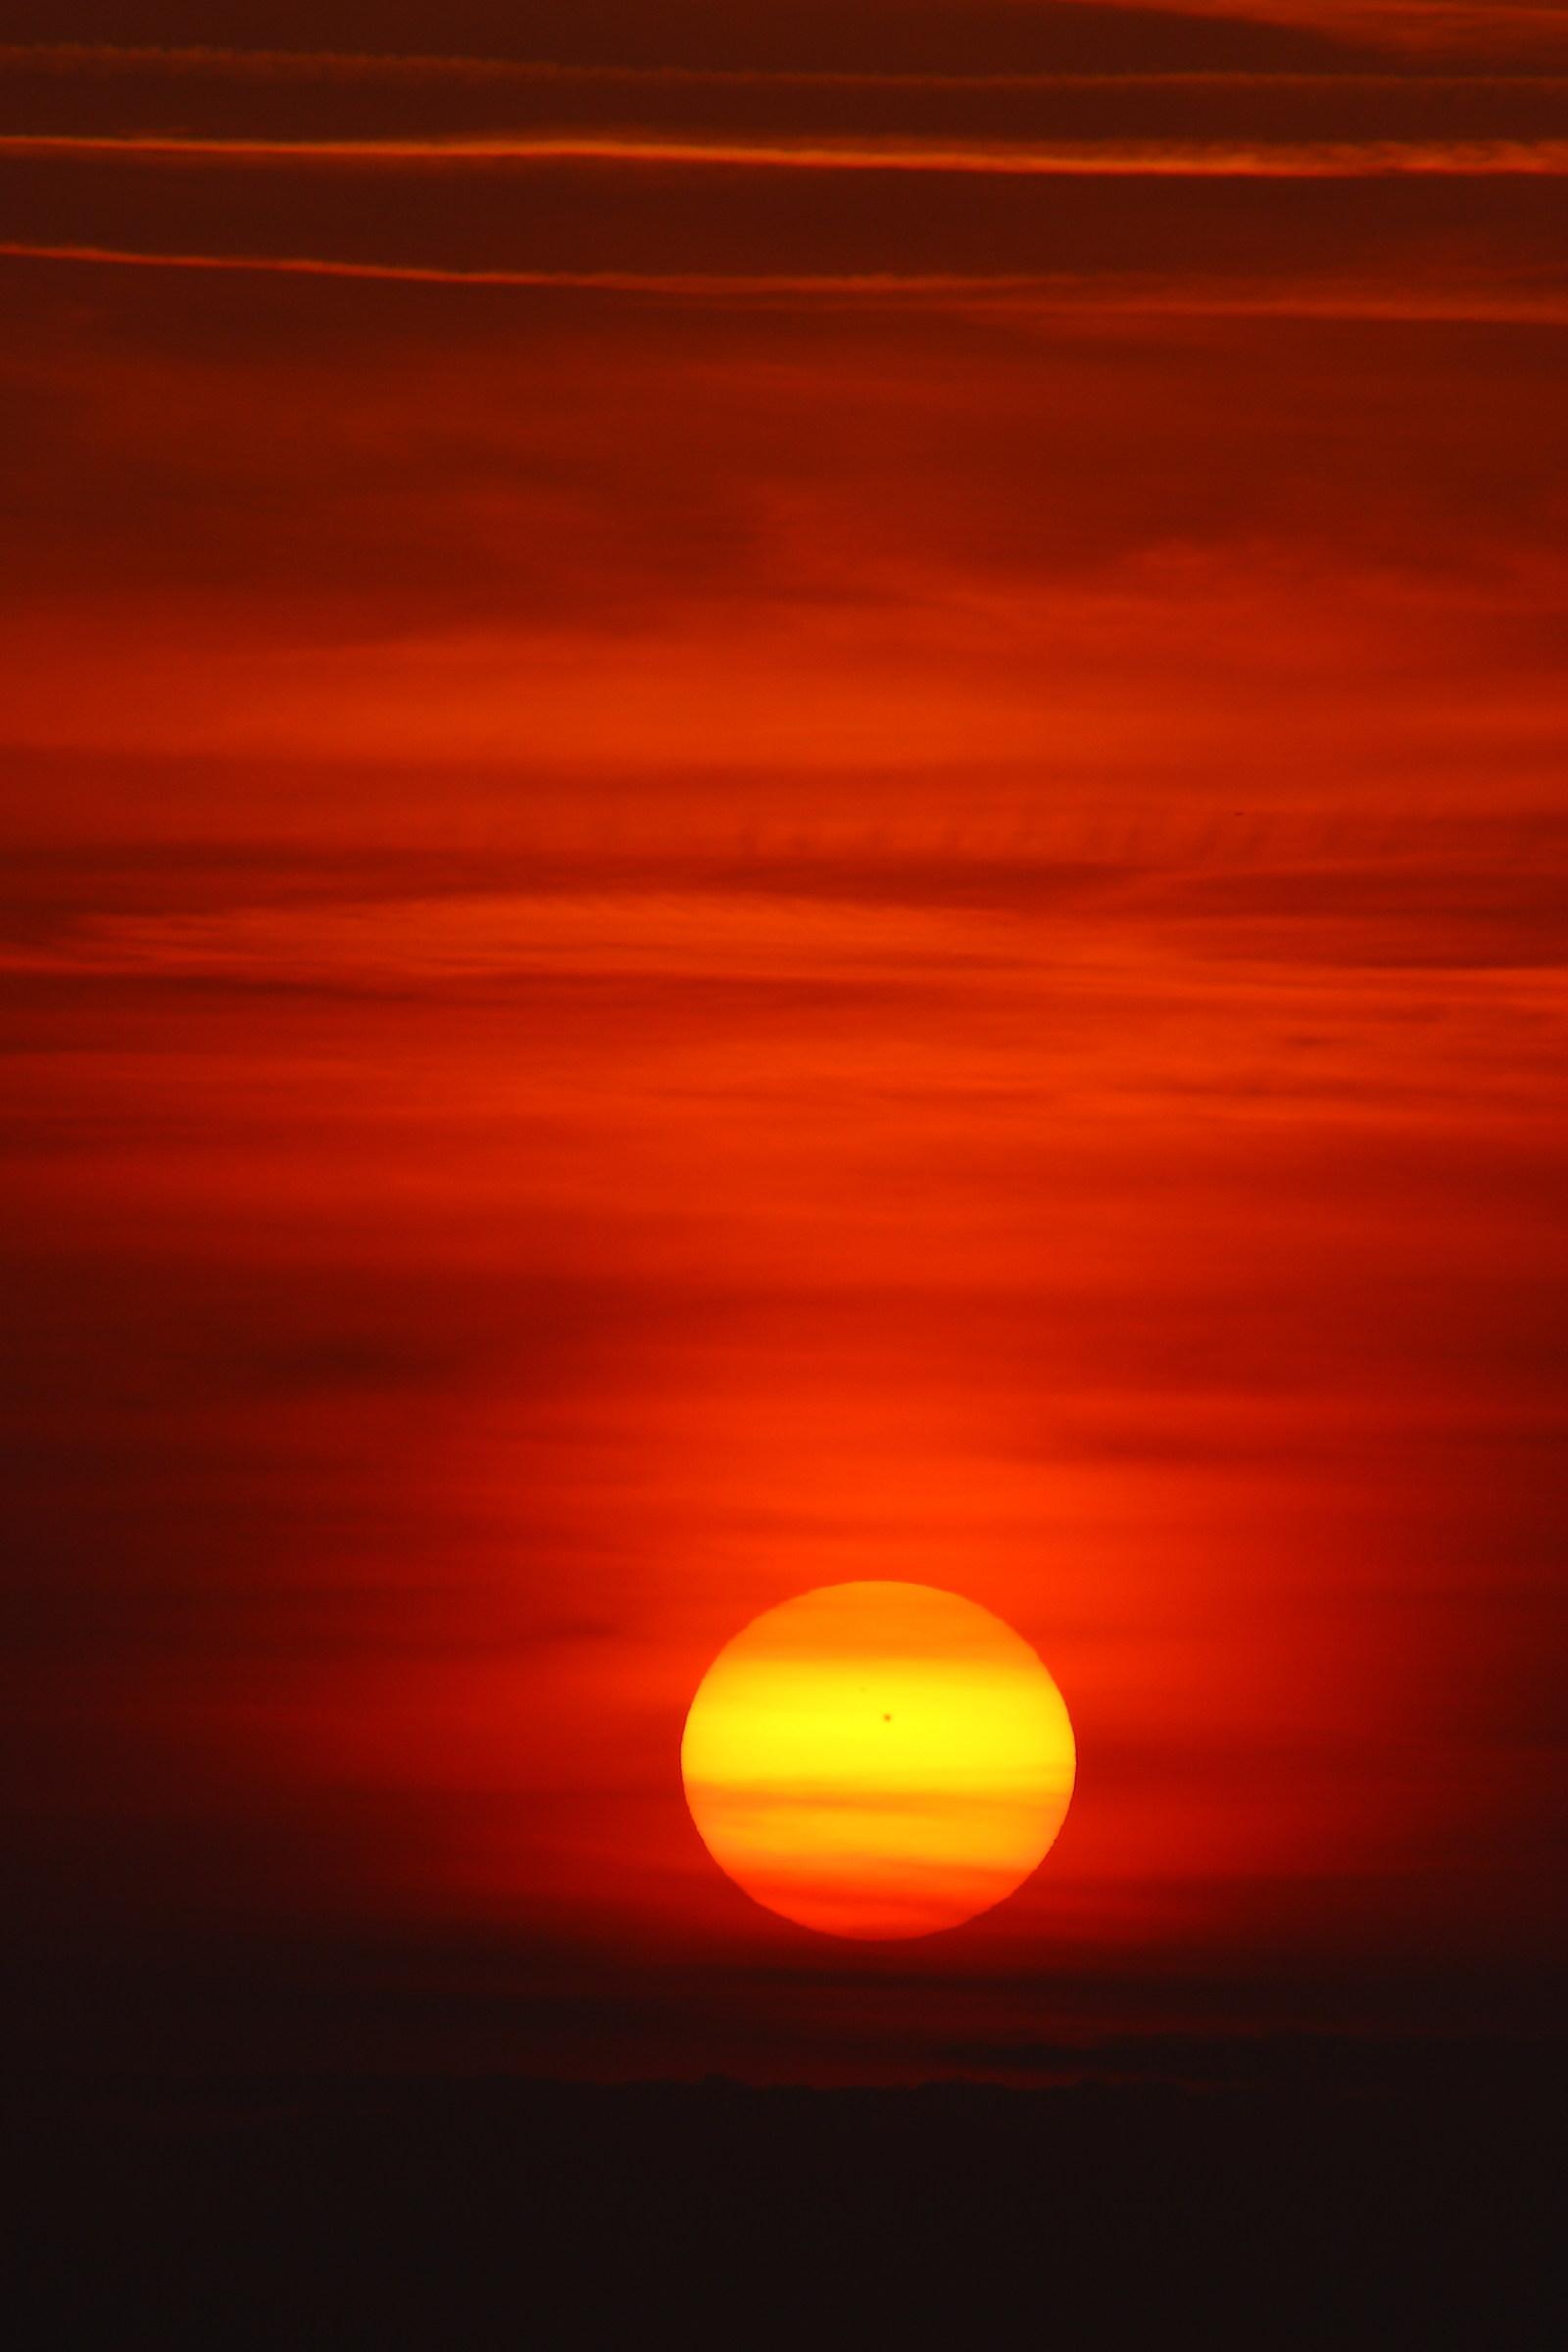 sun with black spot...